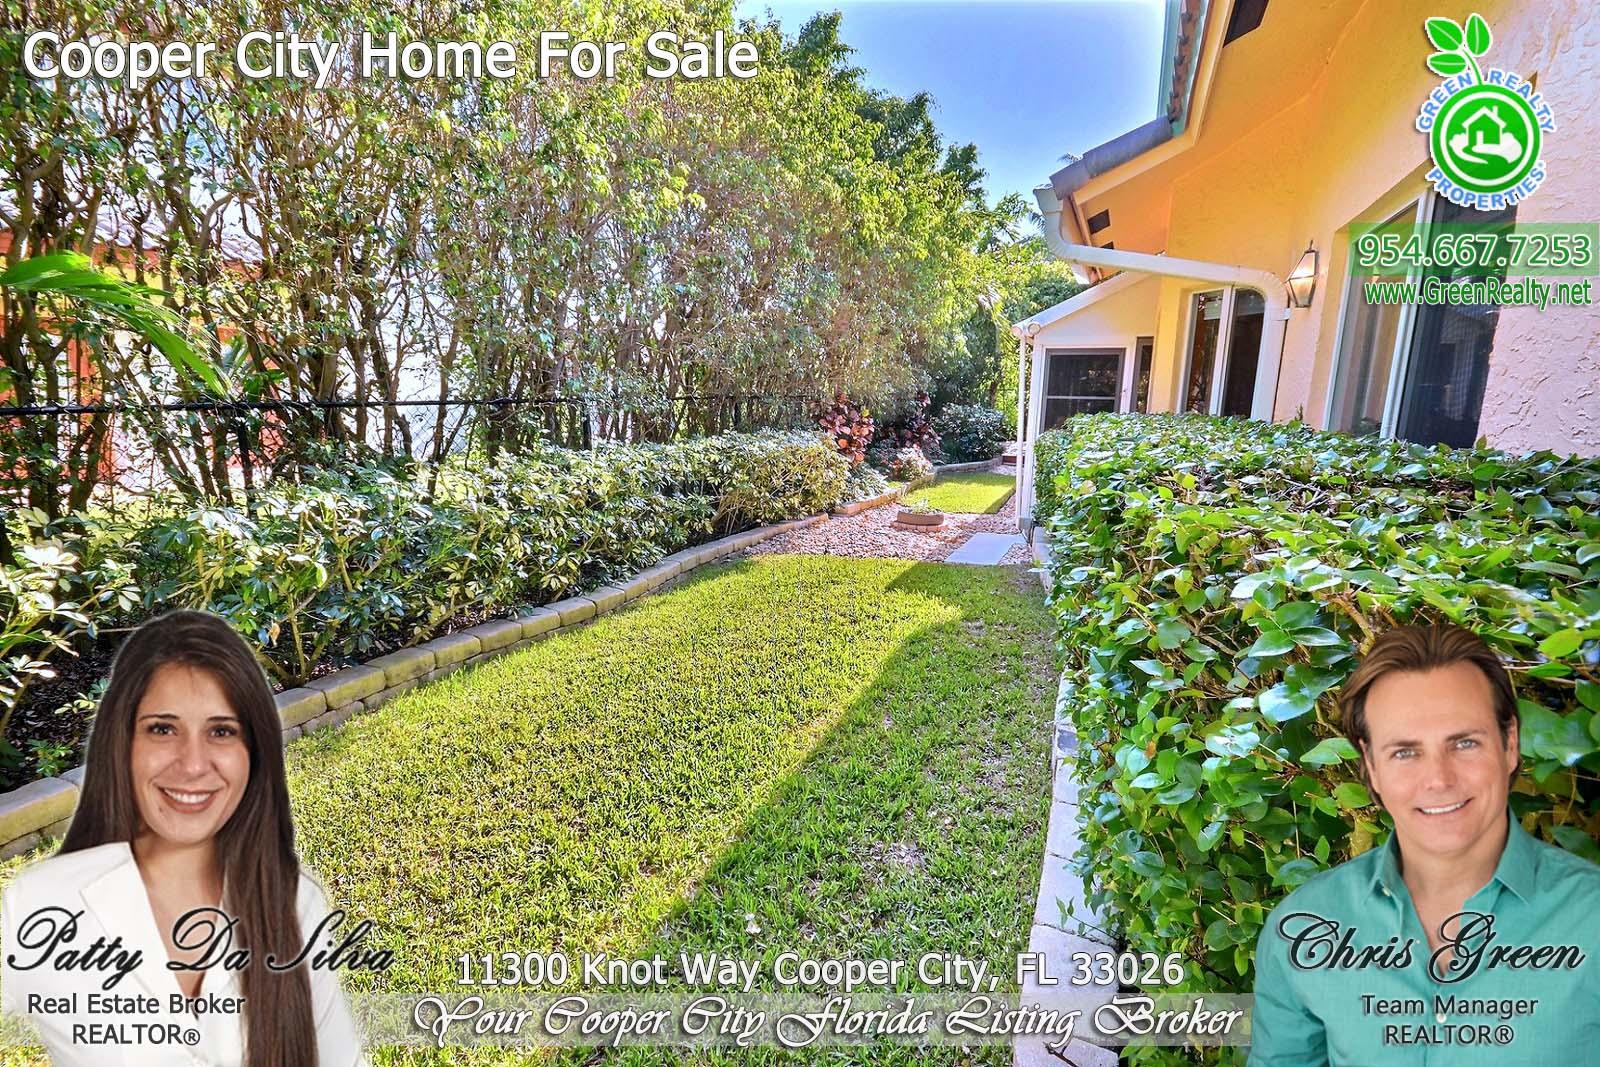 52 Rock Creek Cooper City Homes For Sale (1)